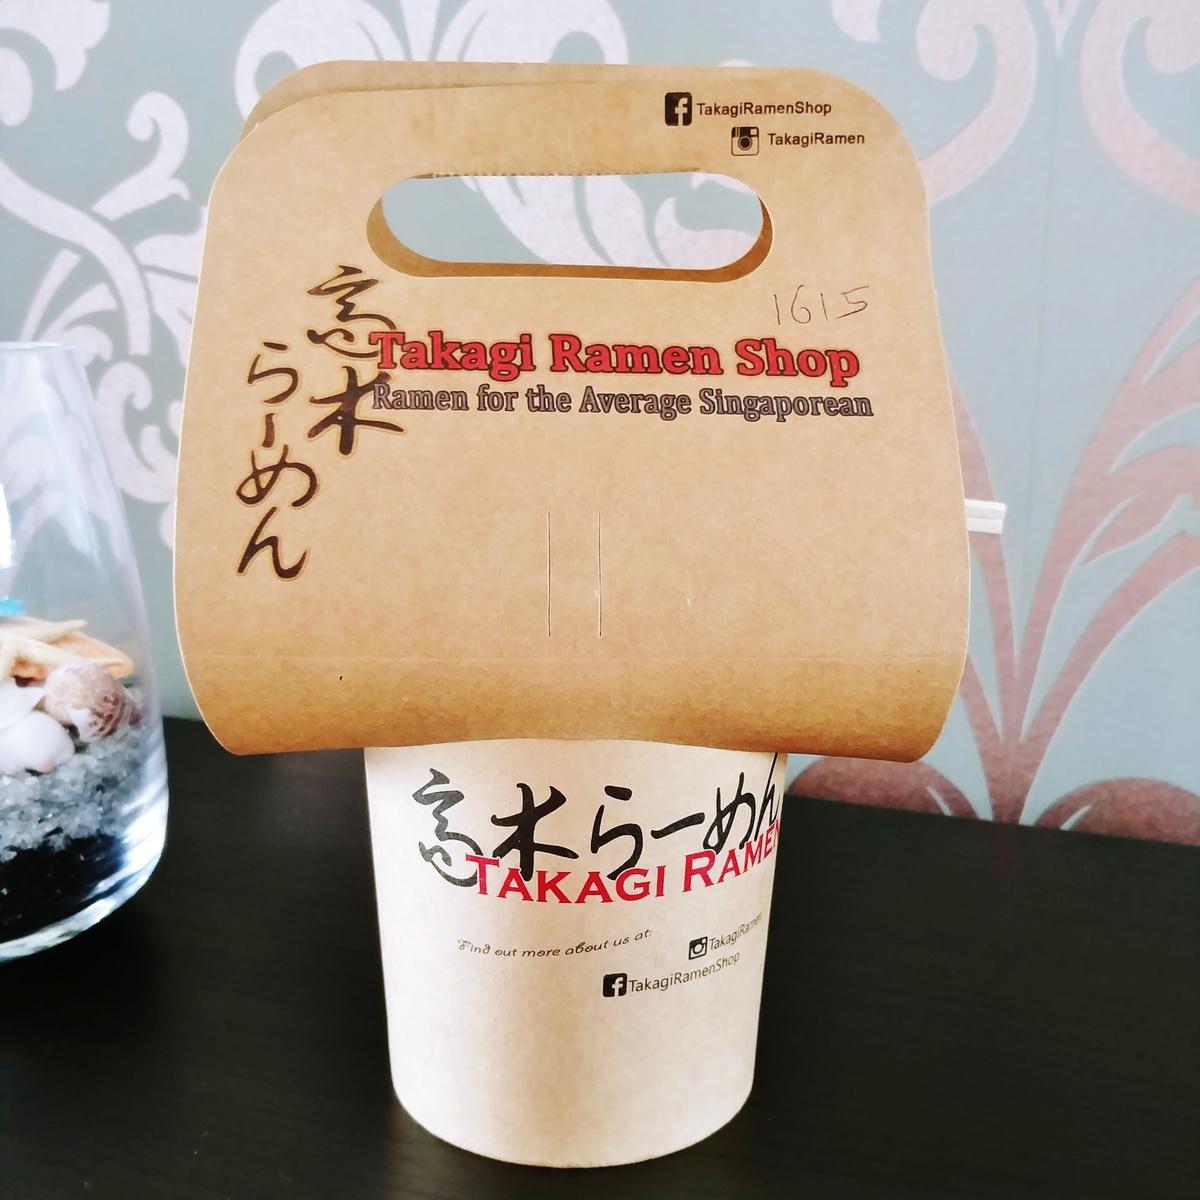 honestbee Food Delivery - Takagi Ramen